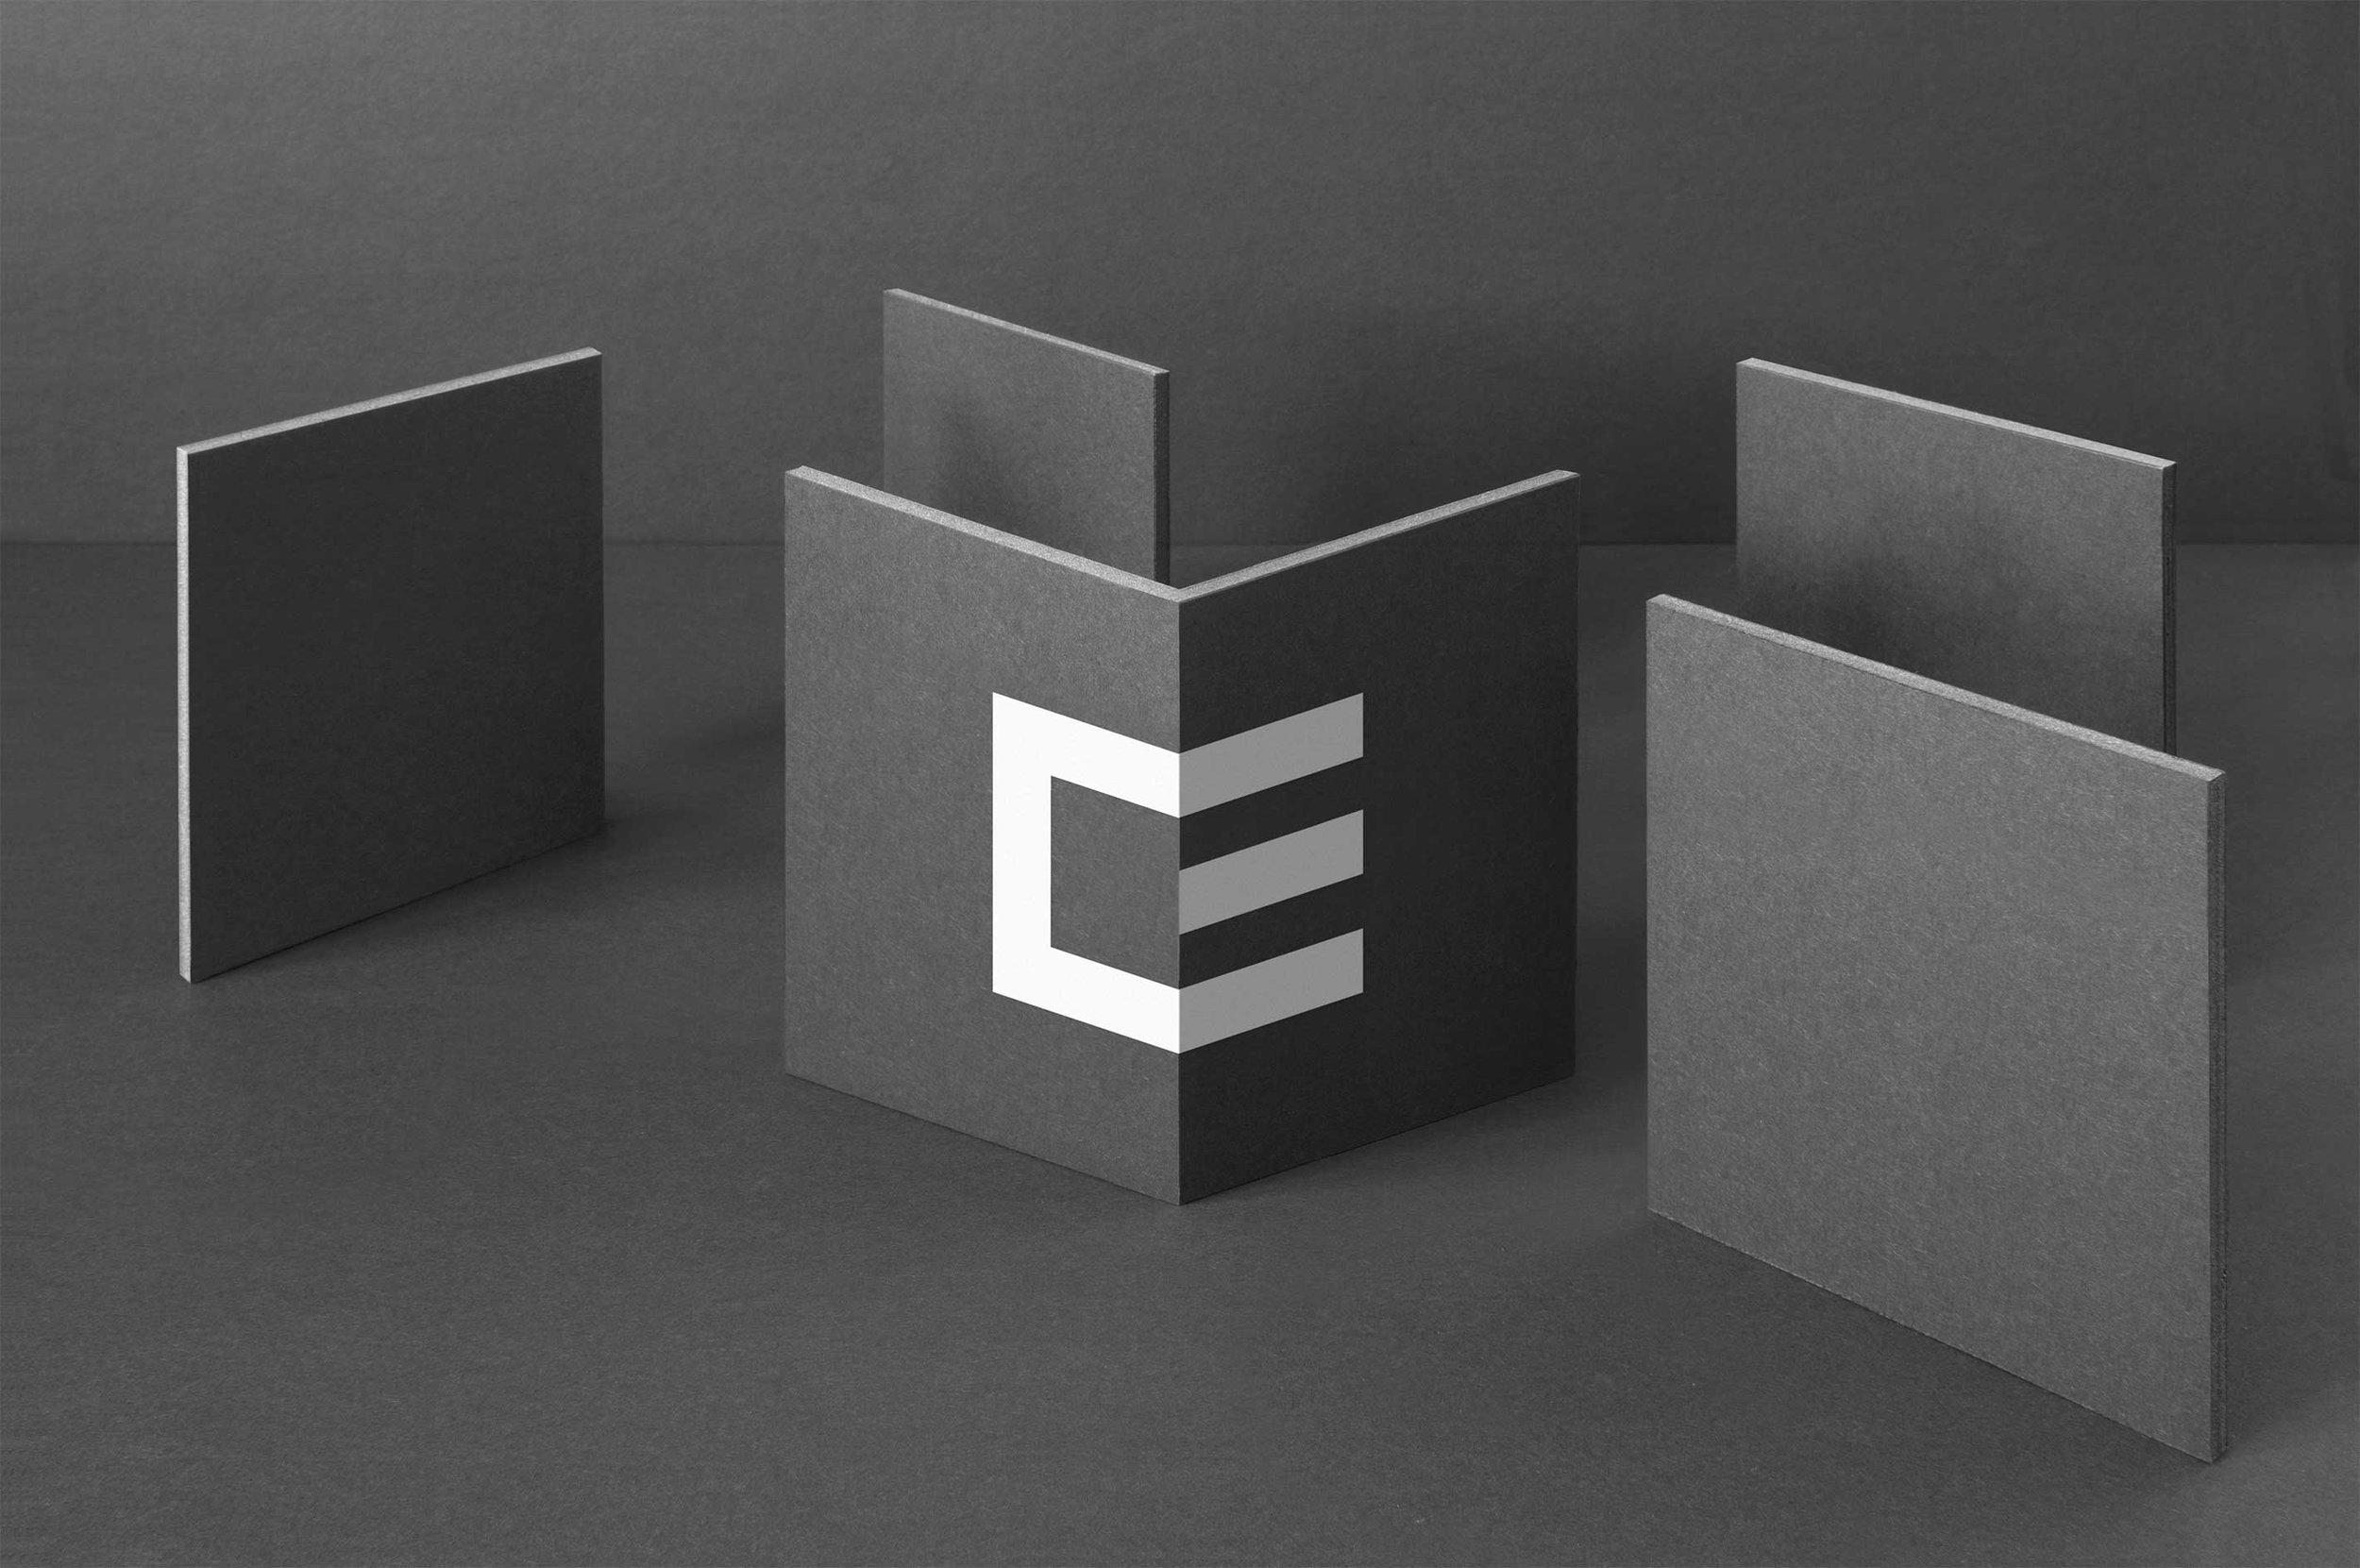 Figure-Jeremy-Hall-Design-Graphique-Quebec-Logo-Branding-Image-De-Marque-Item-Construction-9.jpg